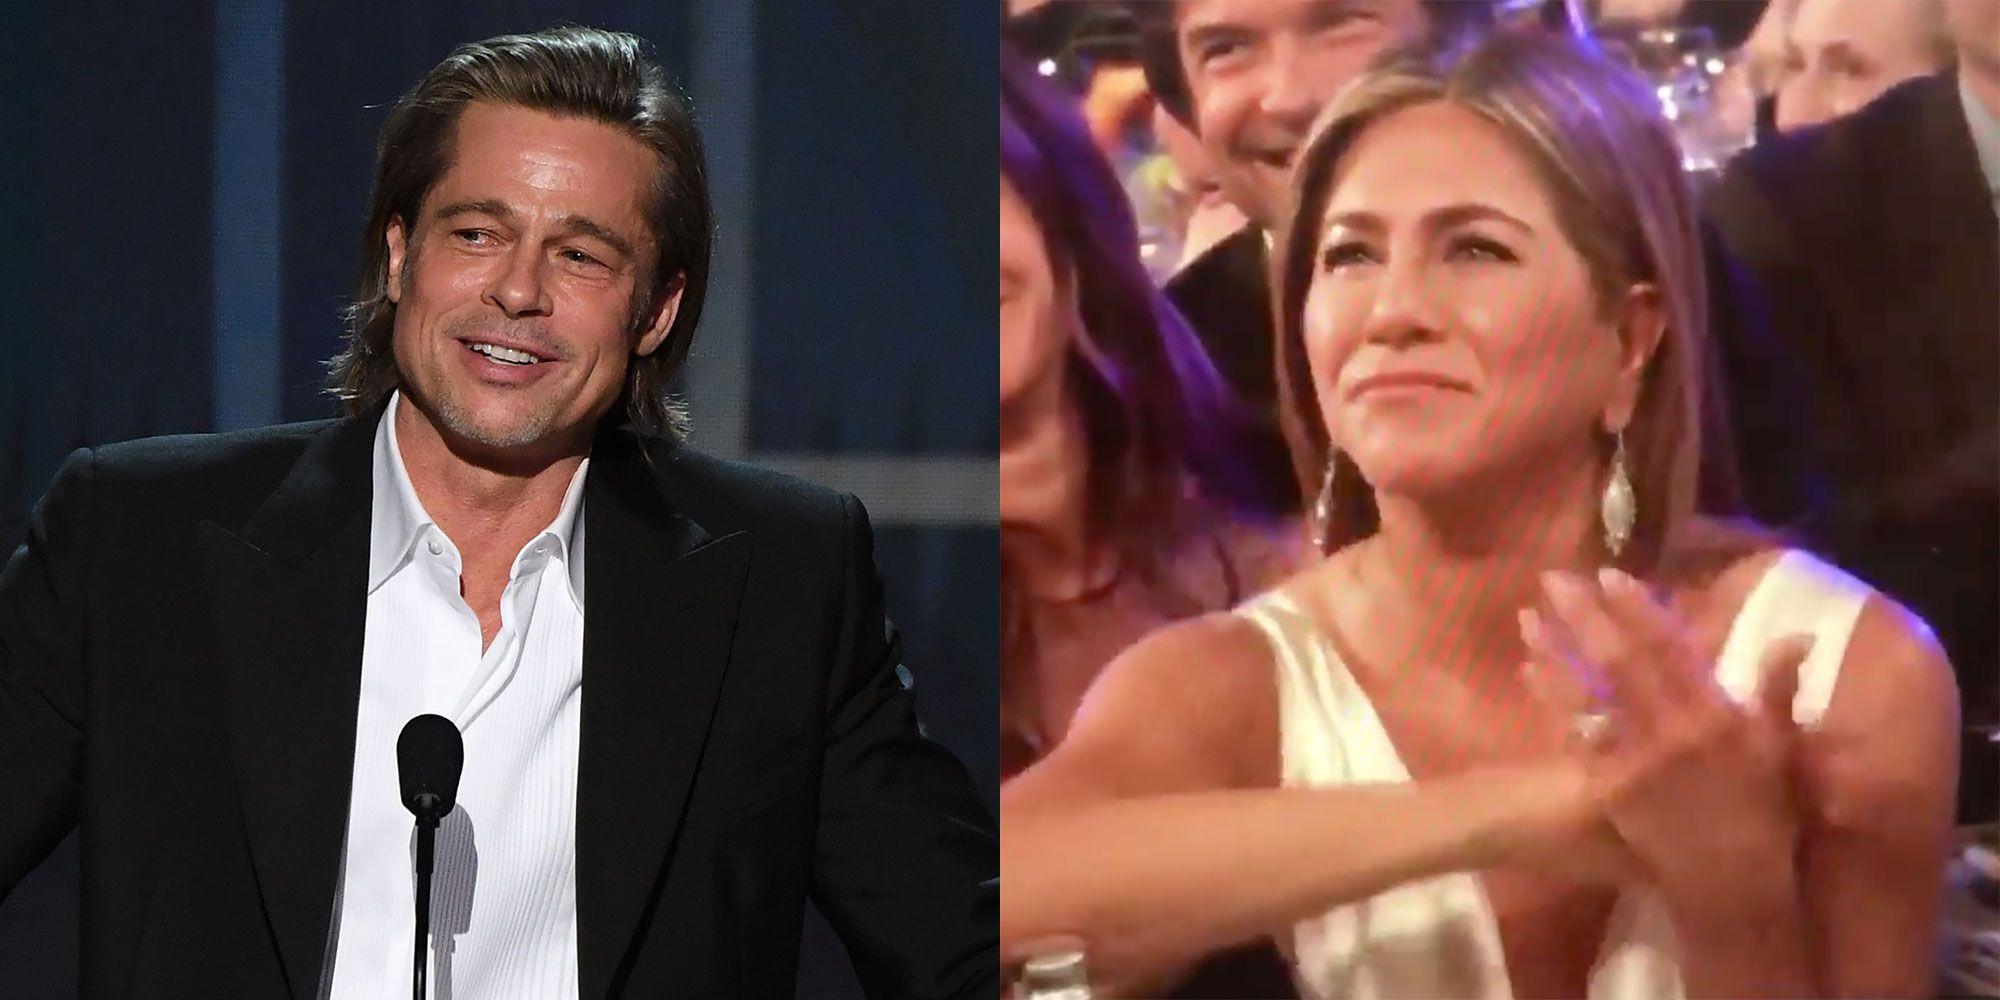 Jennifer Aniston's Reaction to Brad Pitt's SAG Award Acceptance Speech Says a Lot